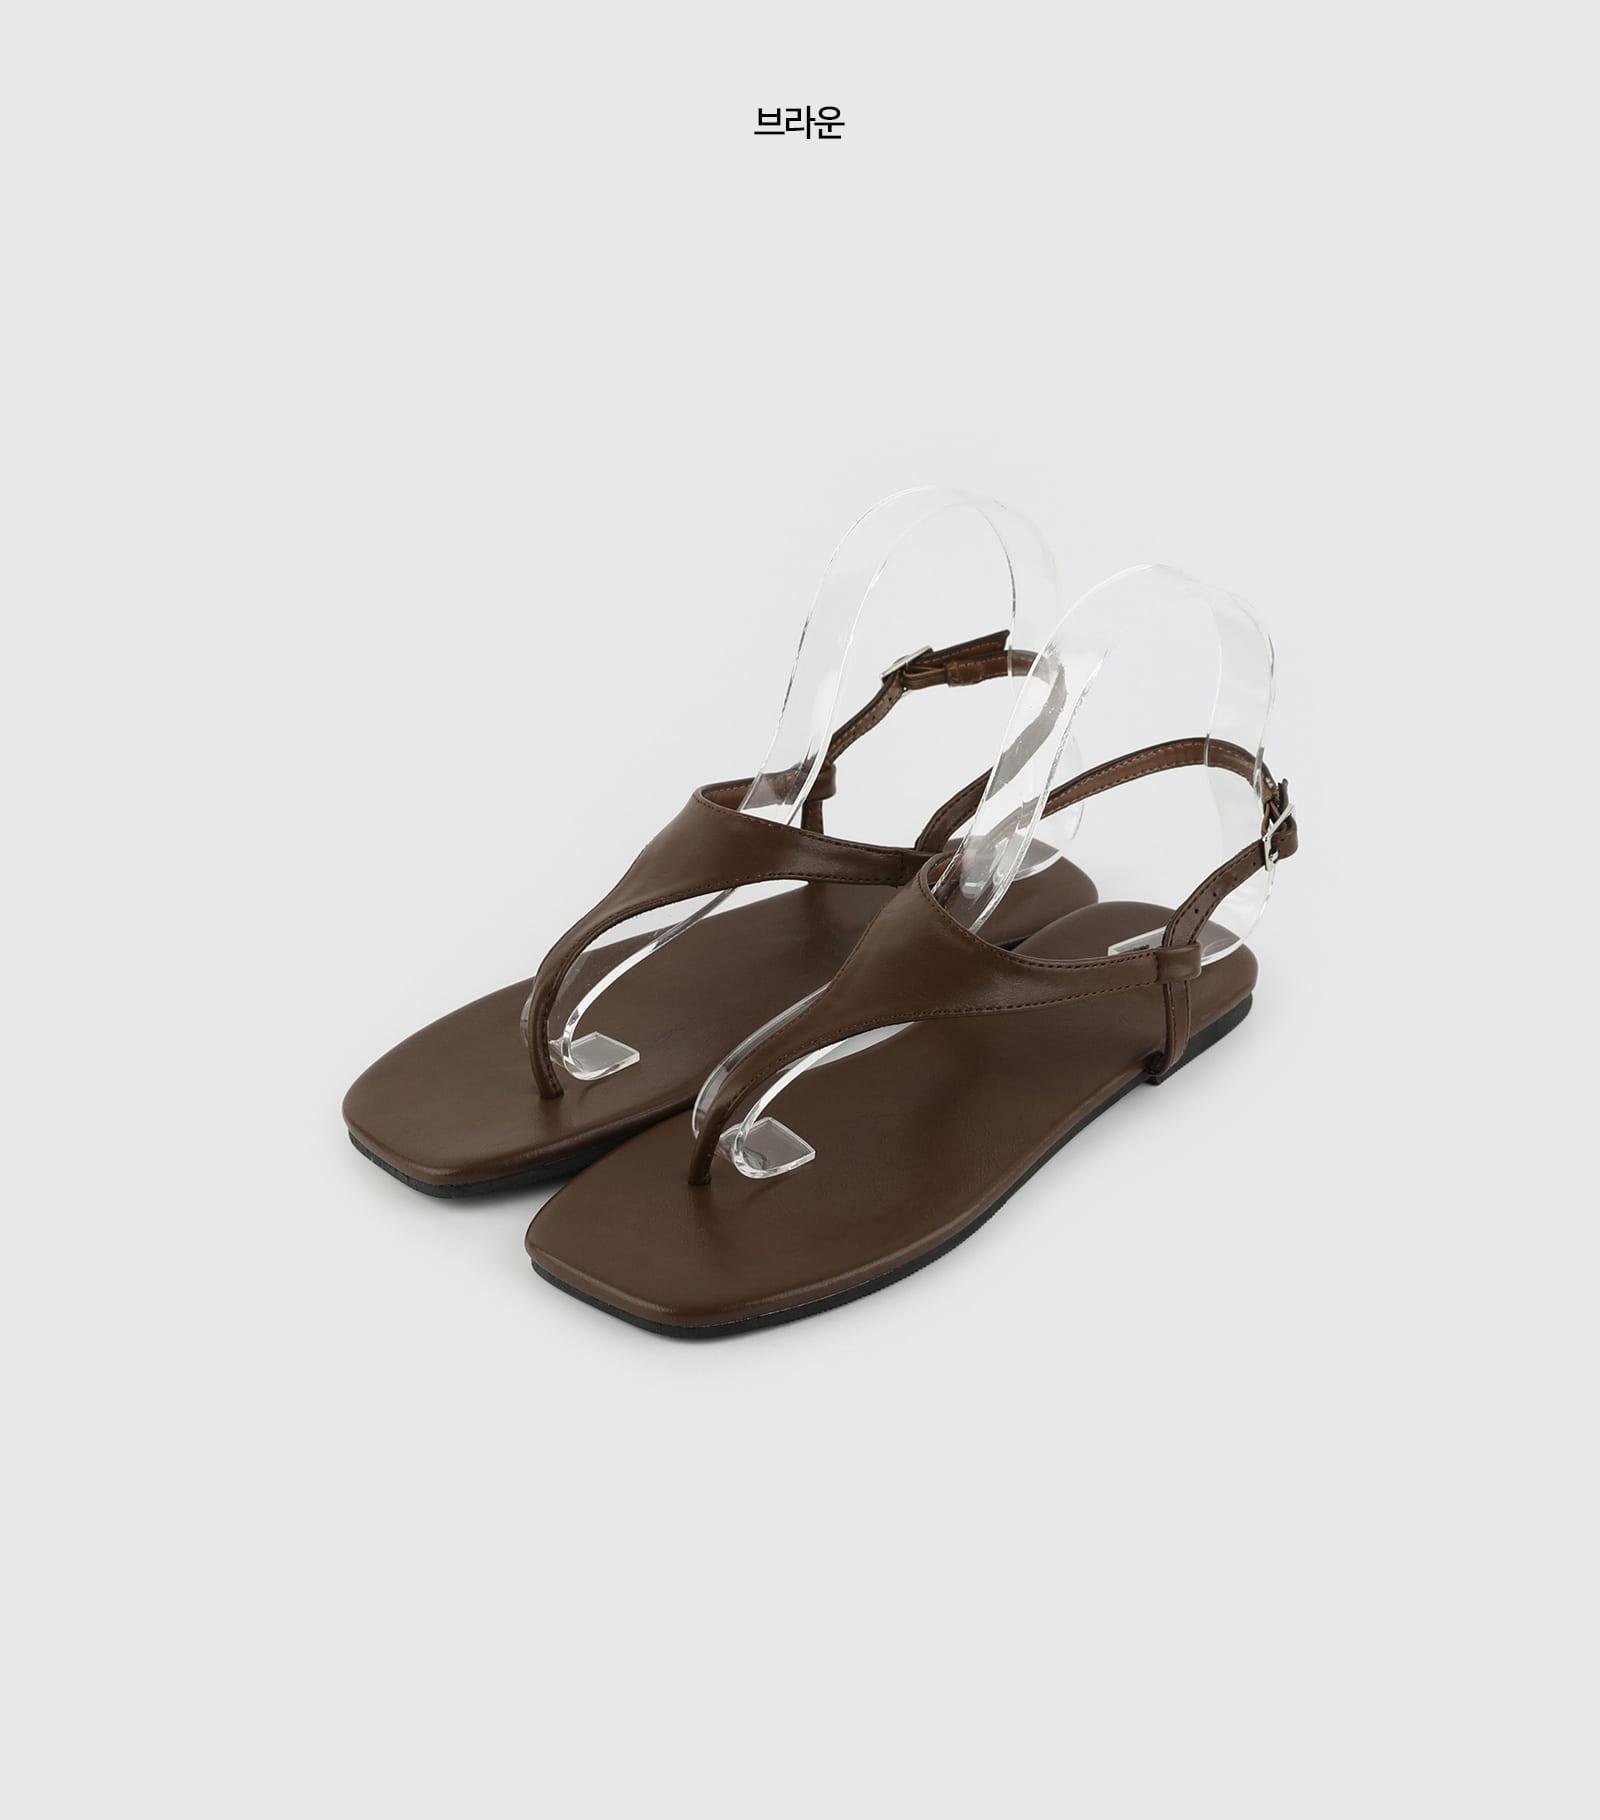 Mile strap flip flop sandals